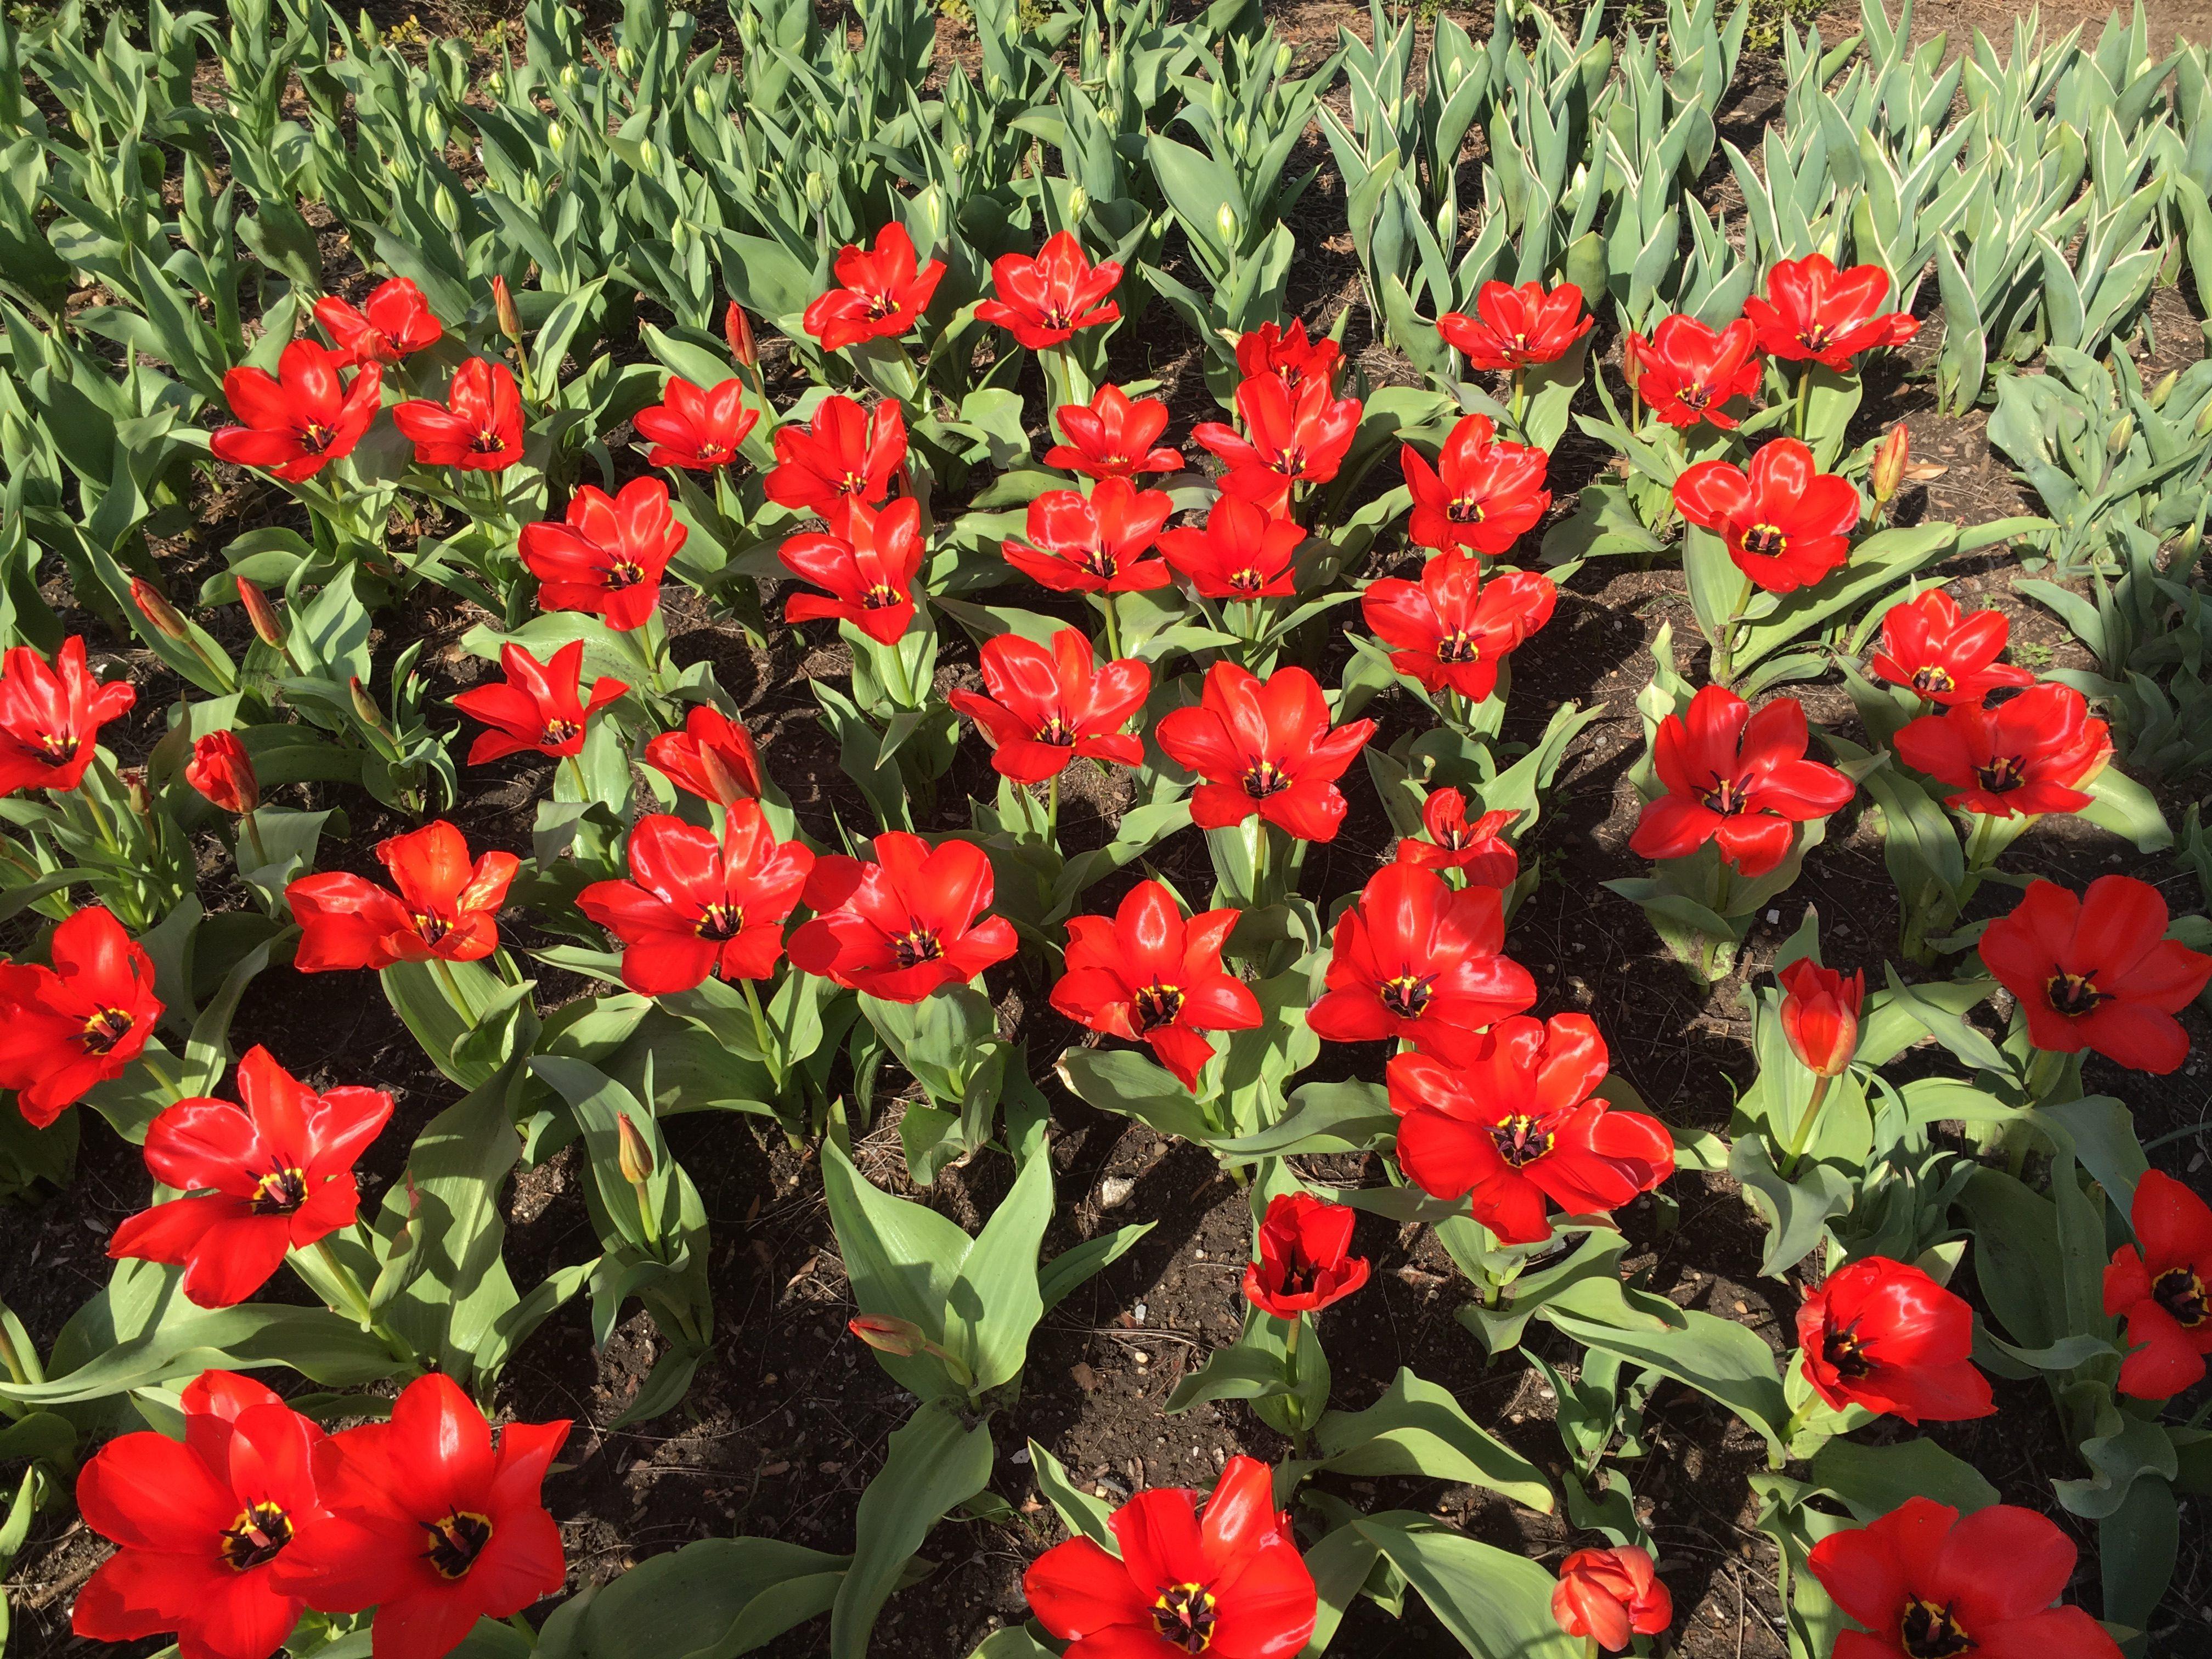 flowers at brooklyn botanic garden